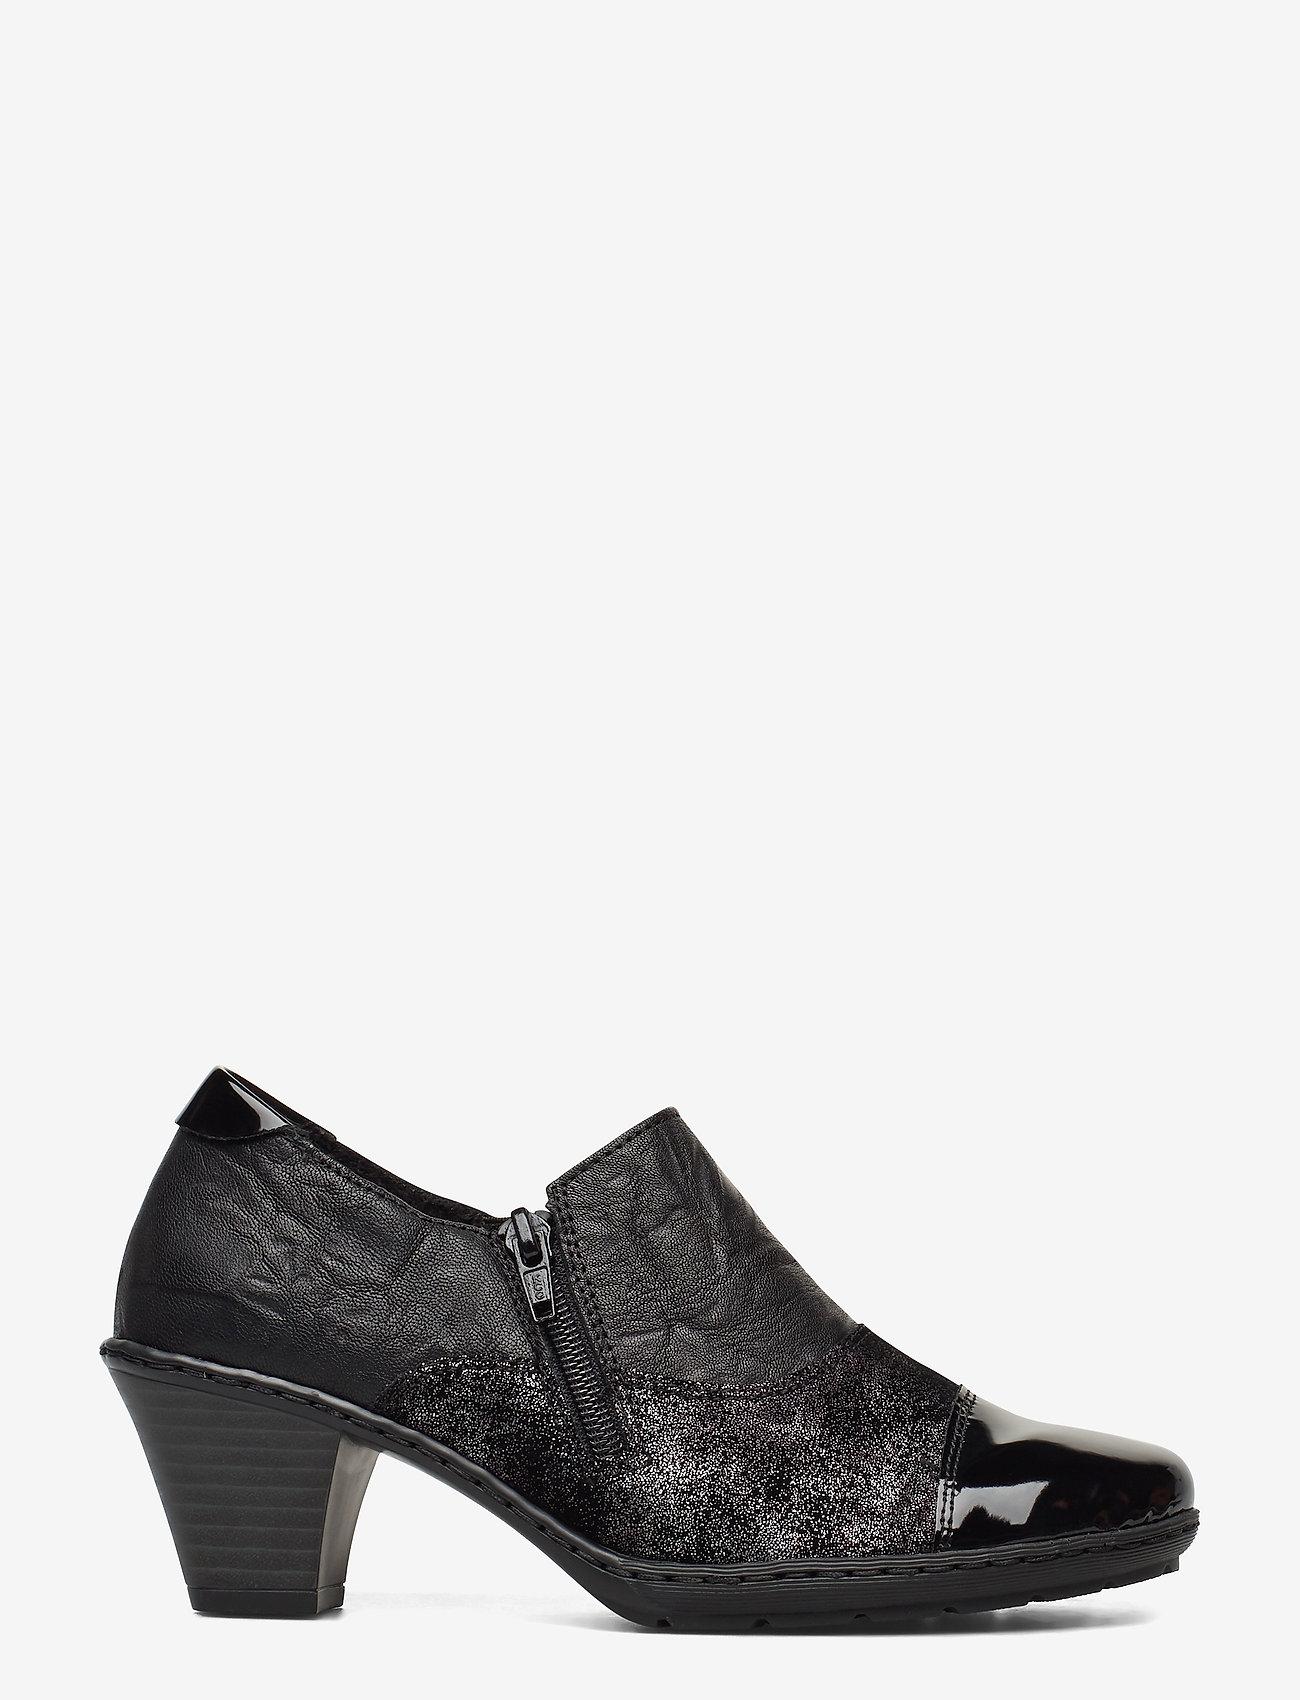 57173-01 (Black) (549 kr) - Rieker